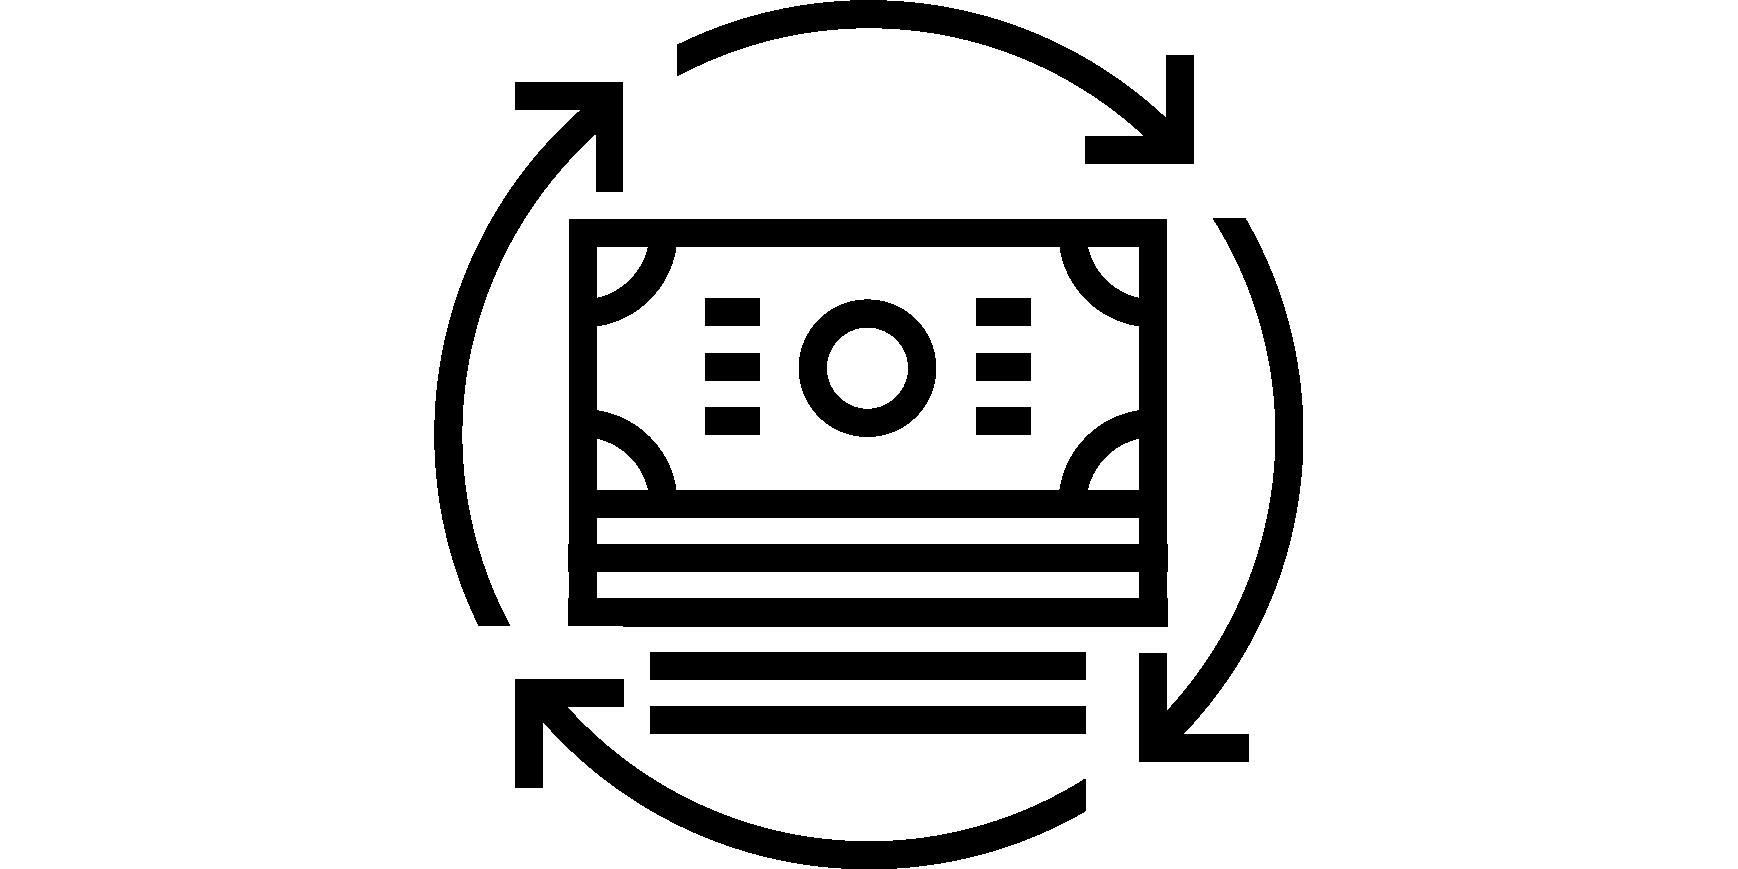 Cash Circle Icon